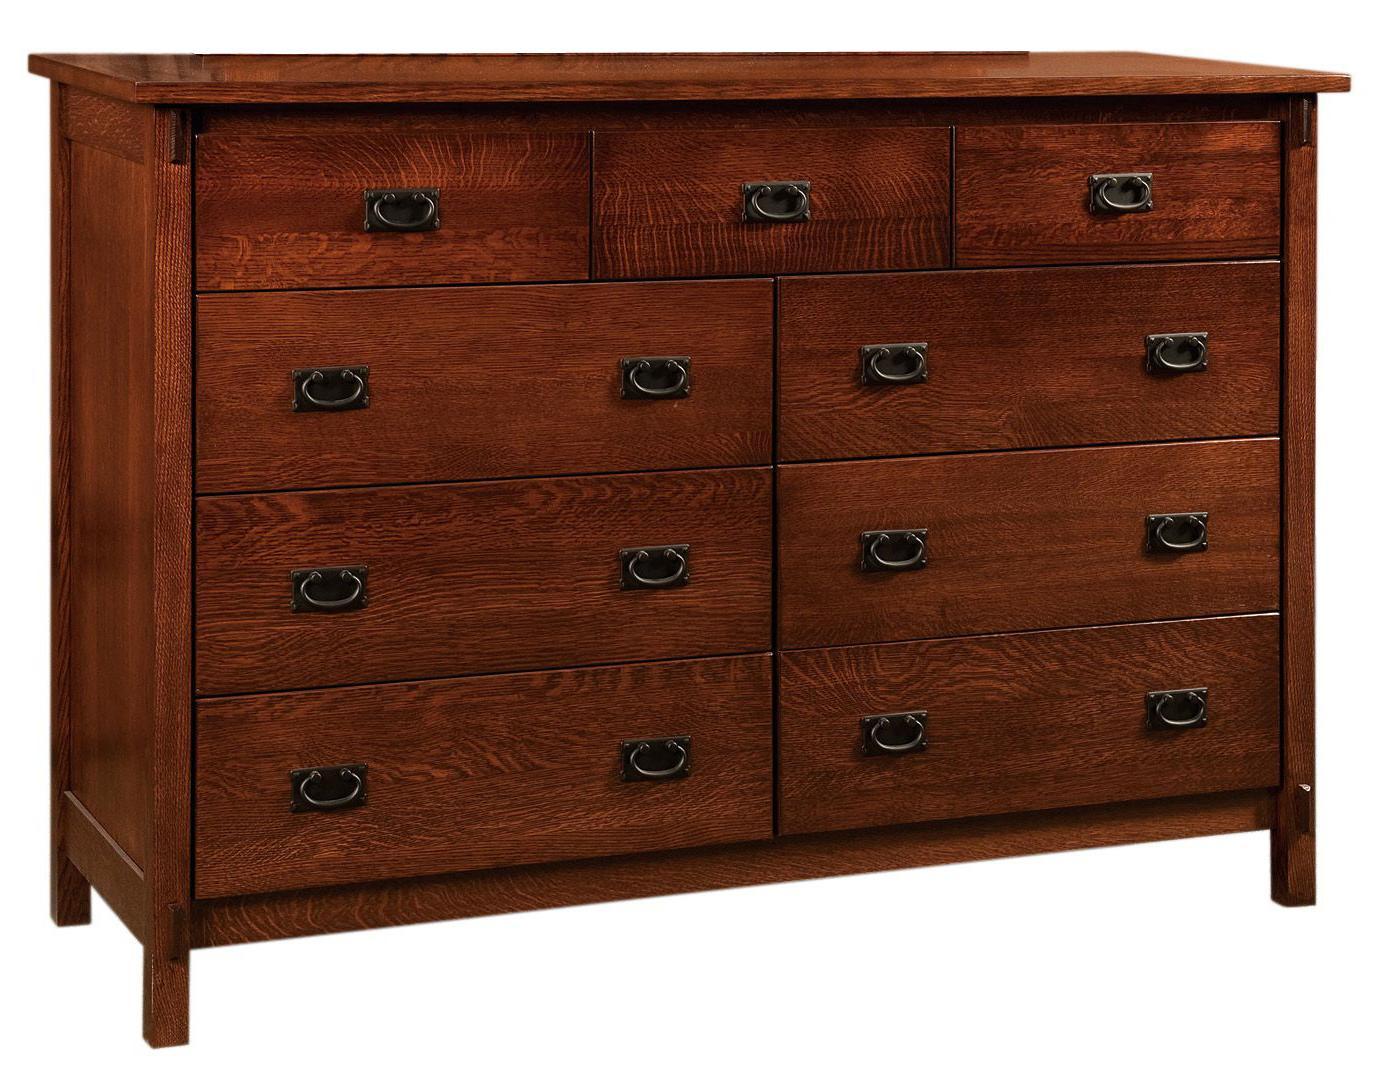 Morris Home Furnishings Savannah Savannah Dresser - Item Number: SHDR-XX